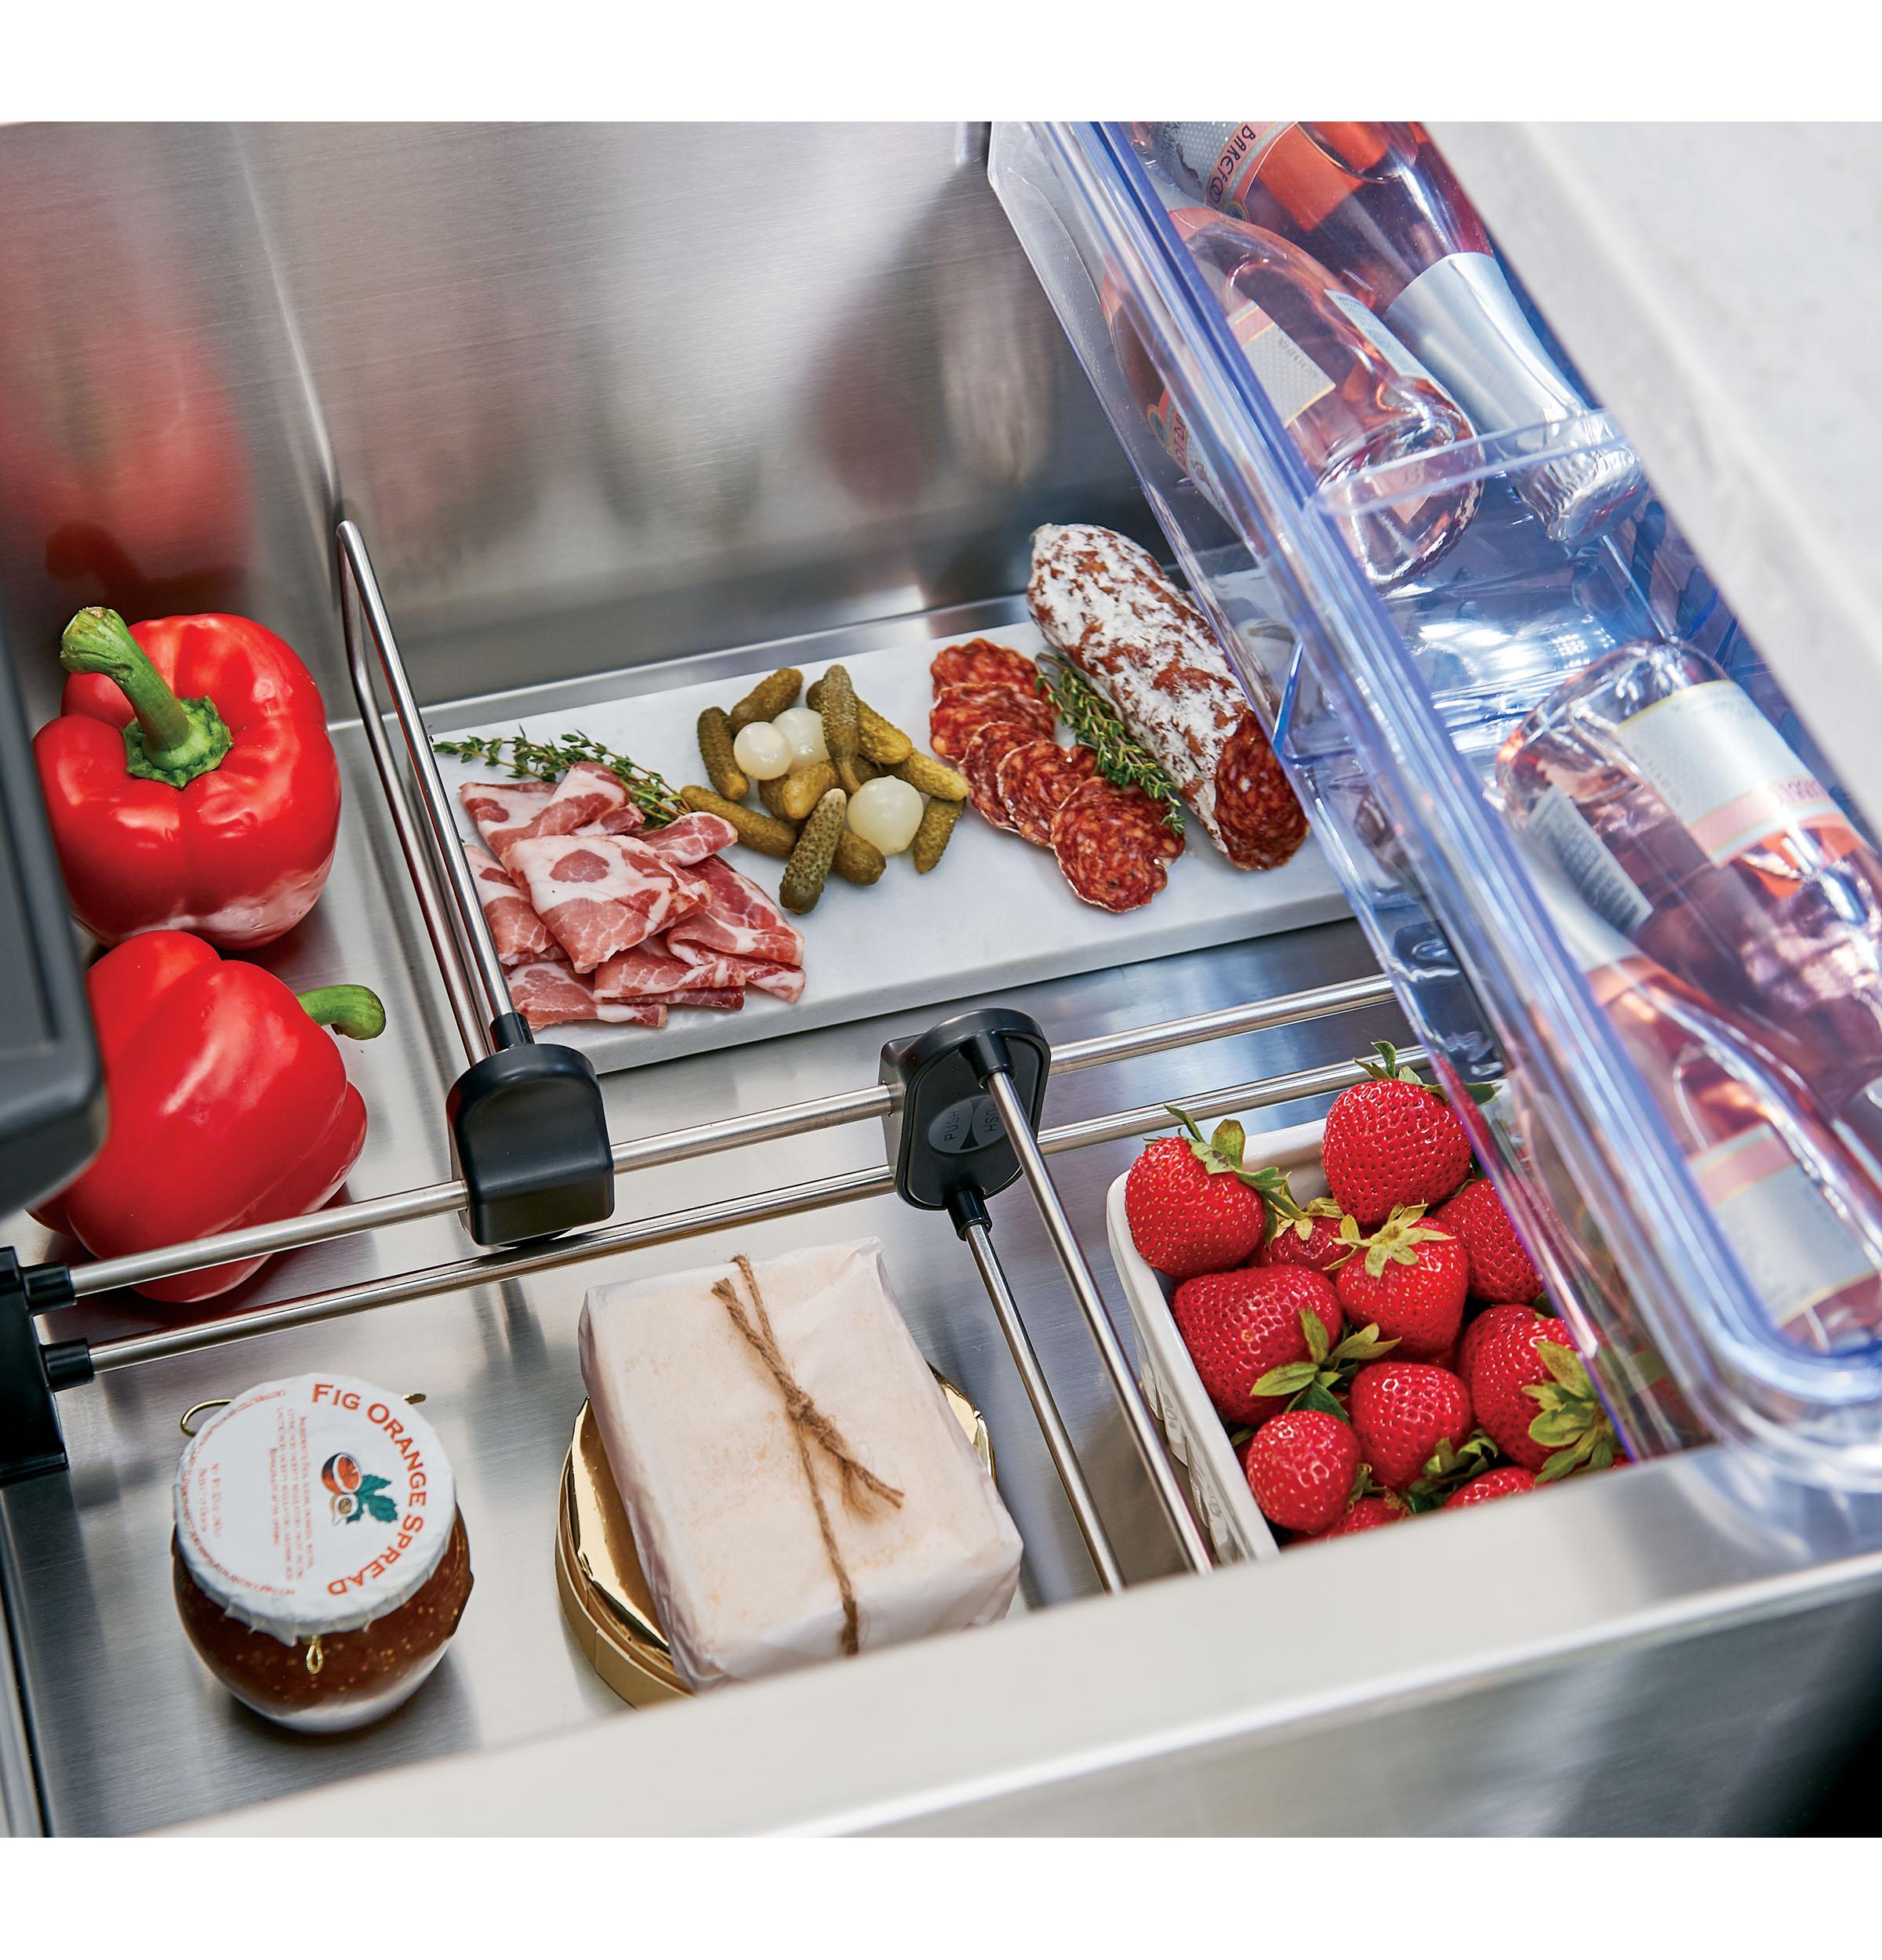 Model: CDE06RP2NS1 | Cafe Café™ 5.7 Cu. Ft. Built-In Dual-Drawer Refrigerator